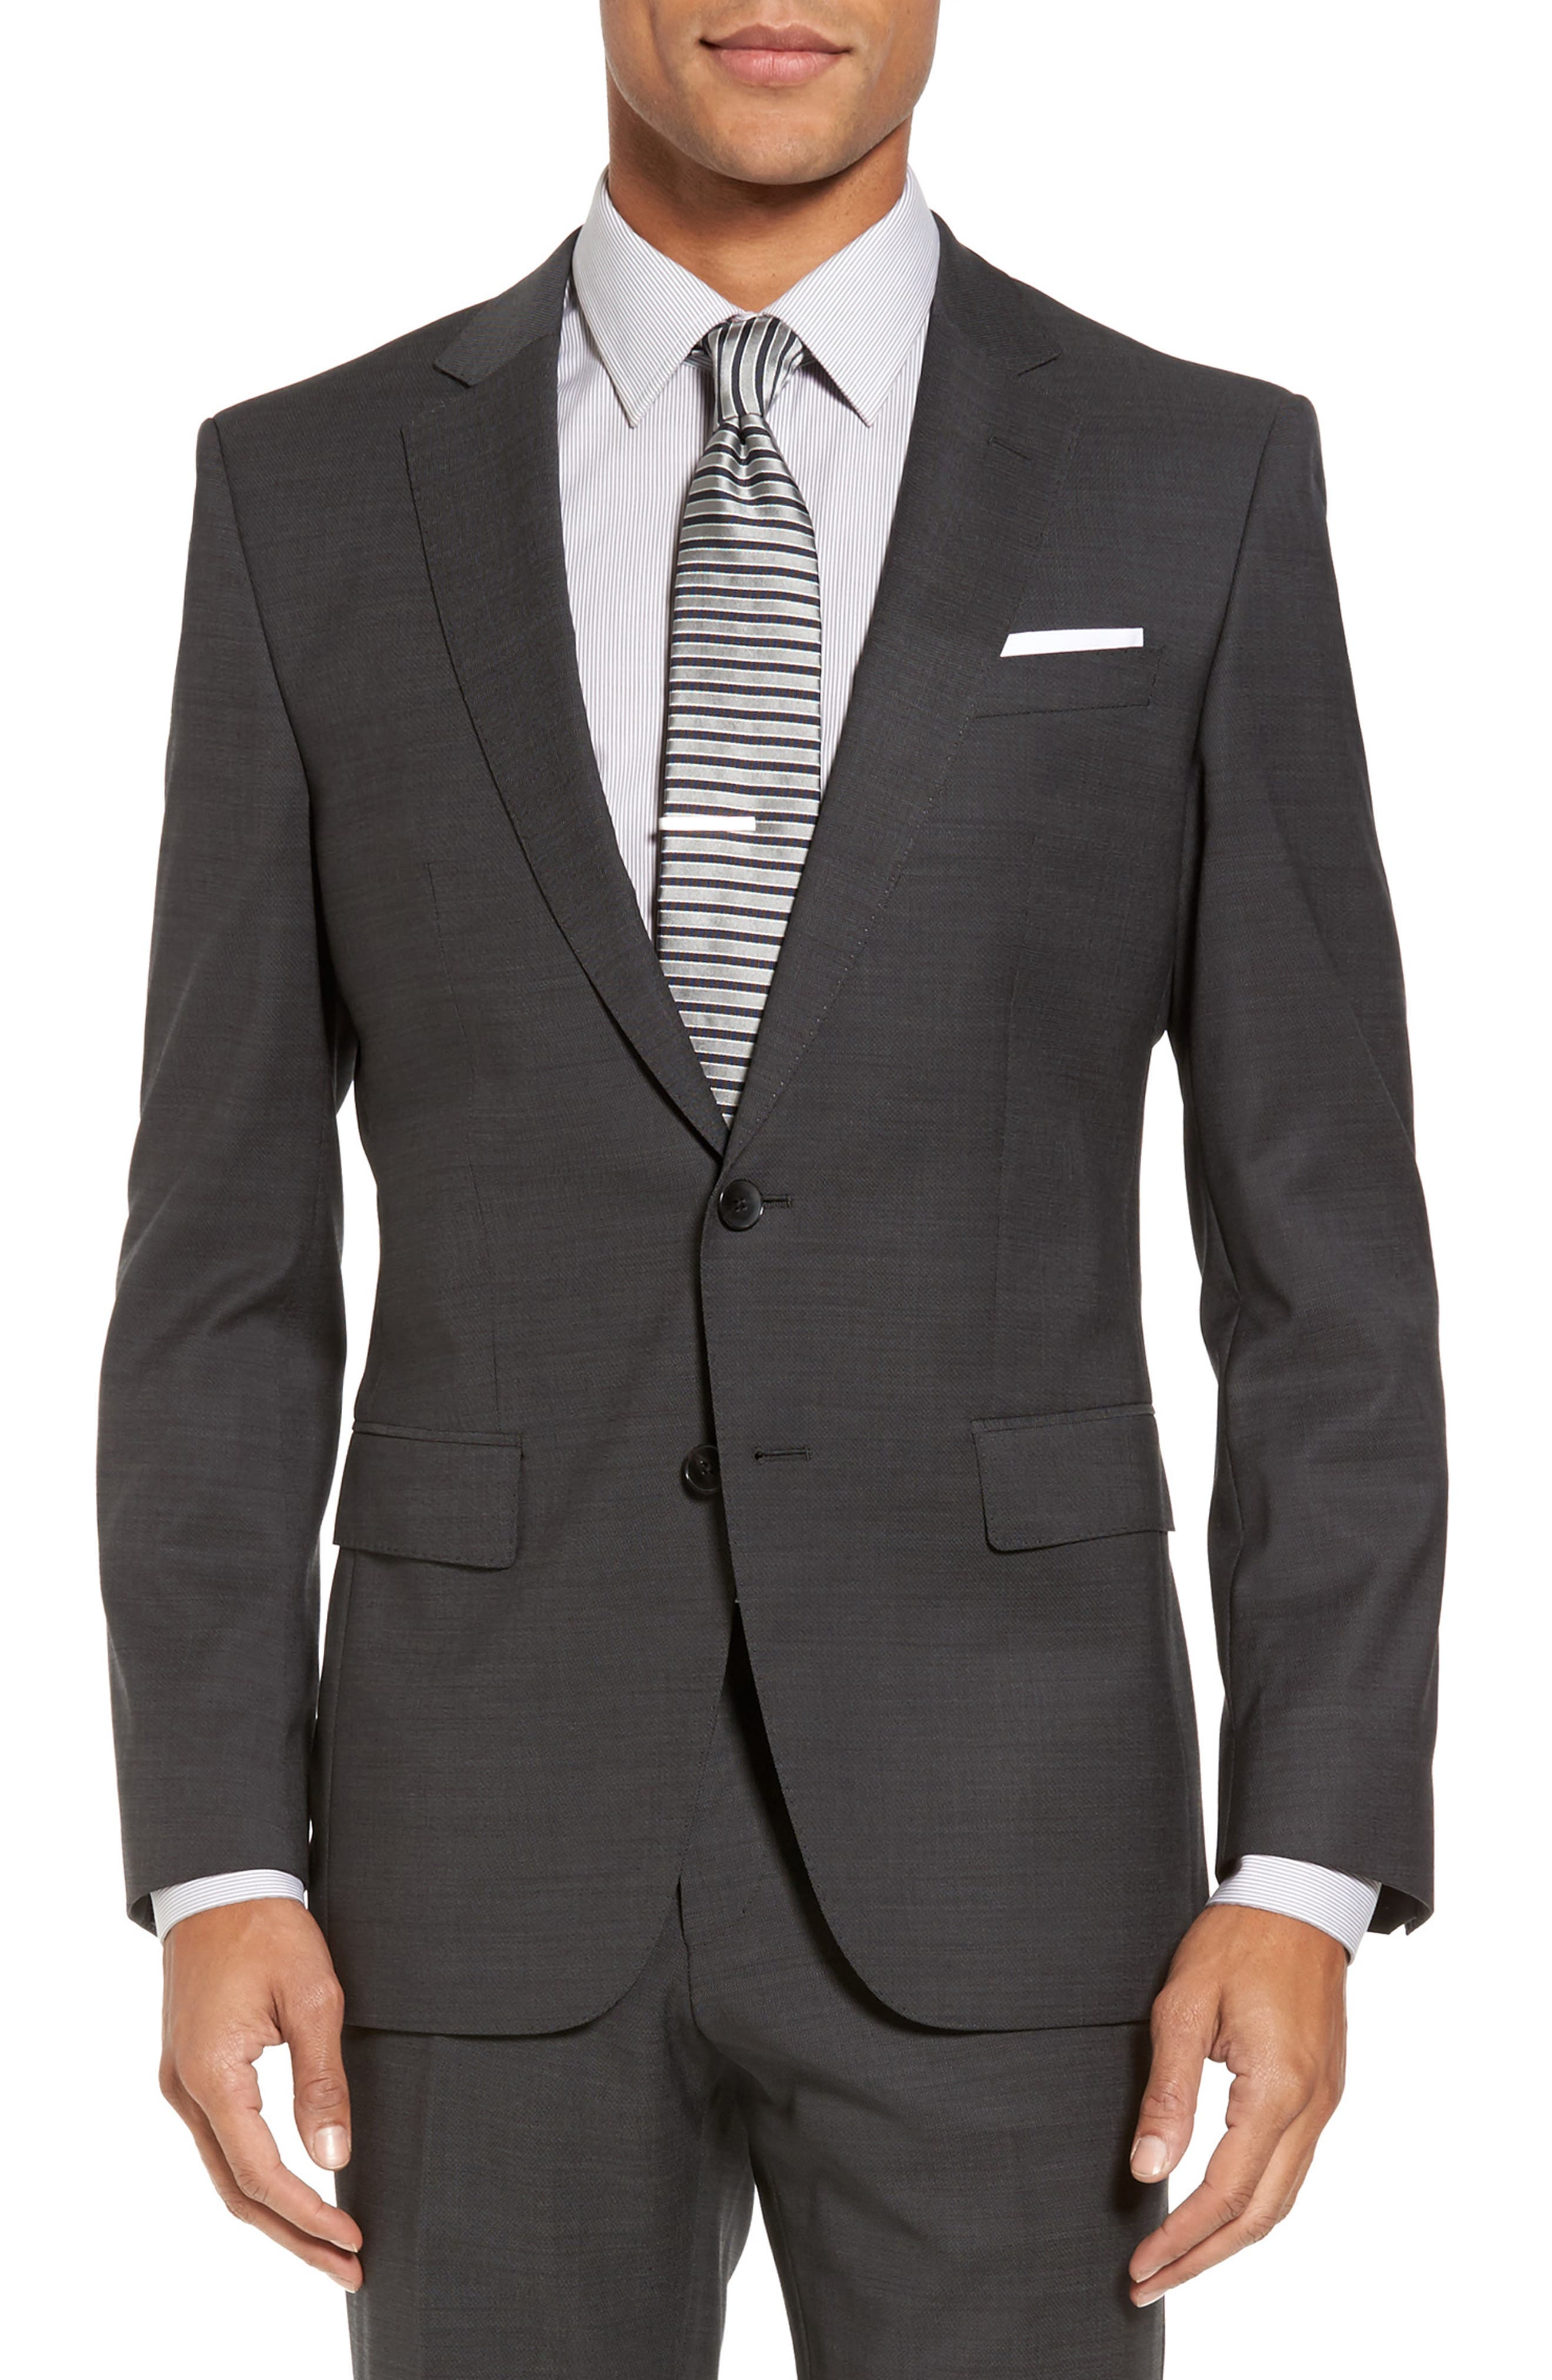 Huge/Genius Trim Fit Solid Wool Suit,                             Alternate thumbnail 5, color,                             Open Grey